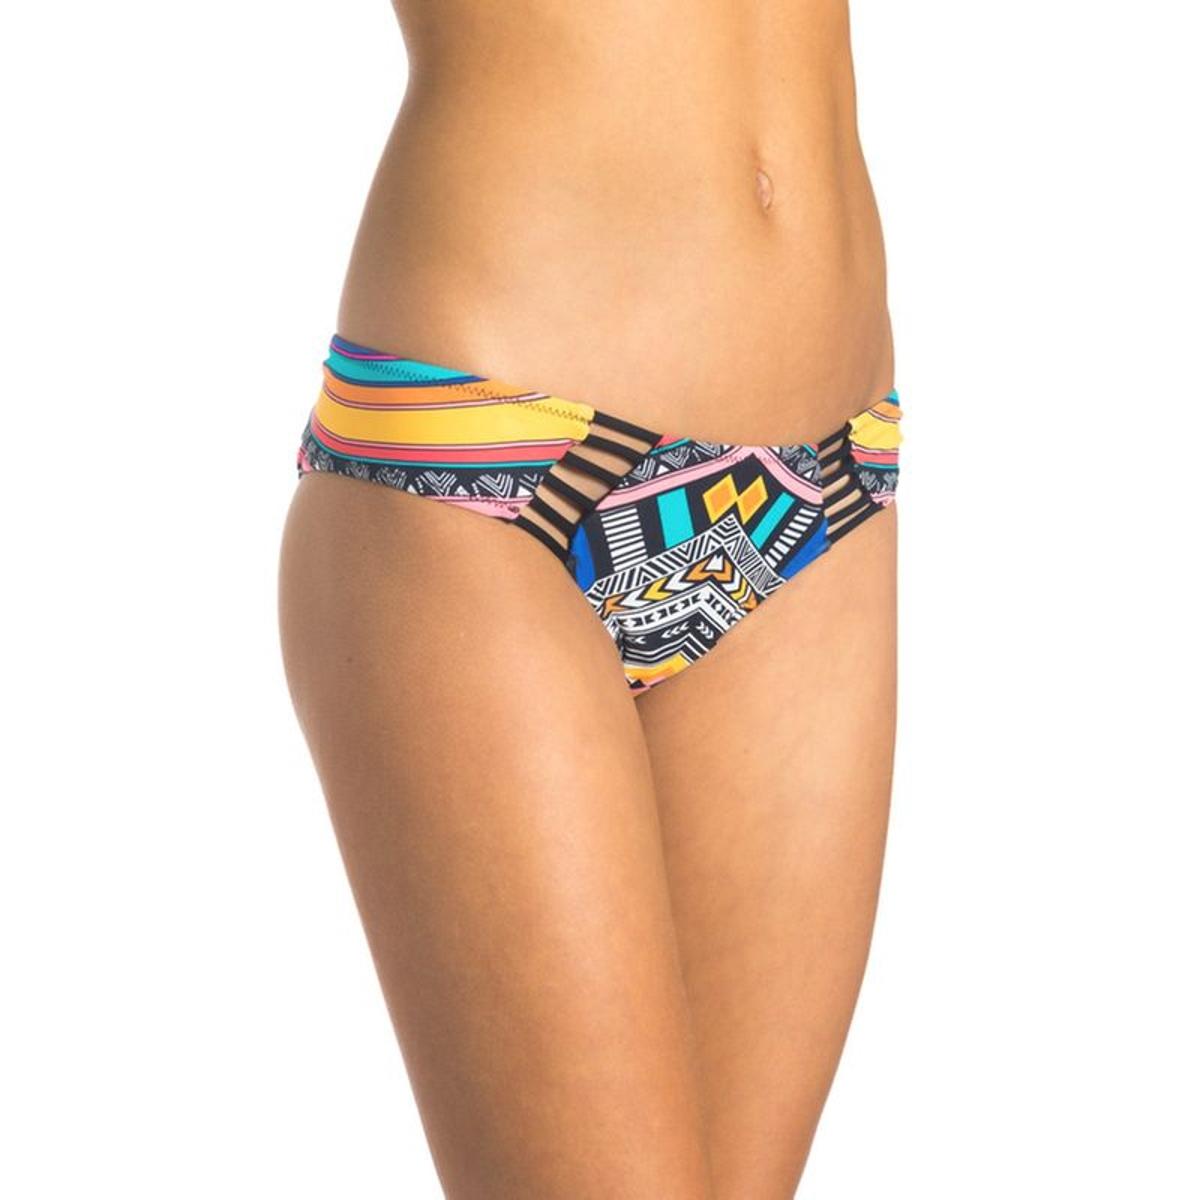 Maillot de bain Culotte Brésilienne Tribal Myth Luxe Hipster (bas)